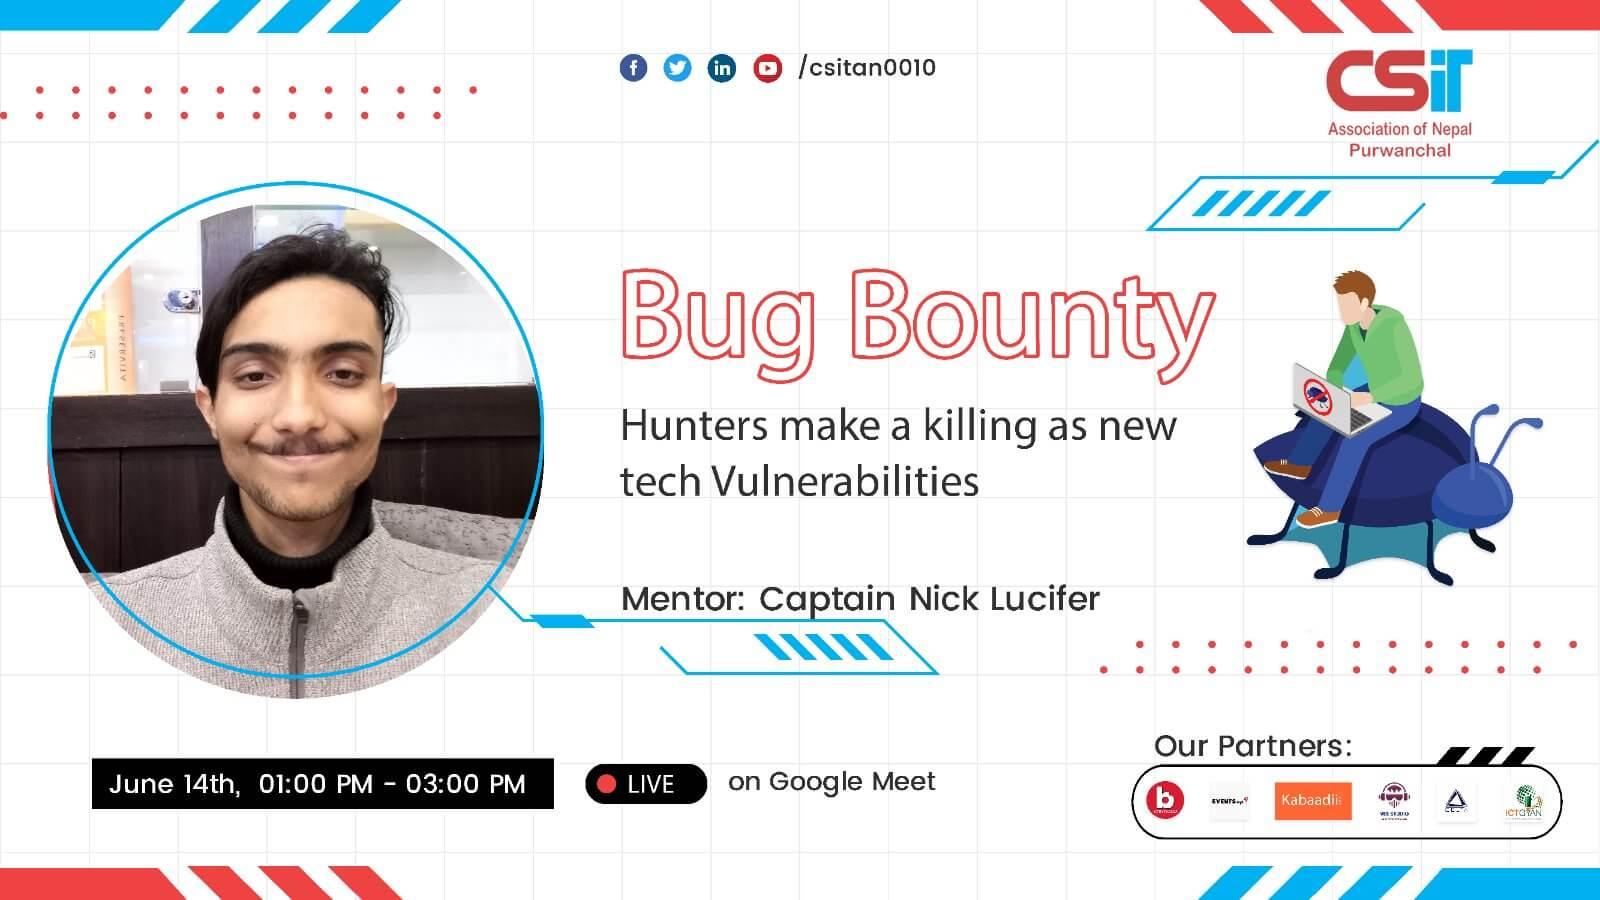 bug bounty captain nick lucifer